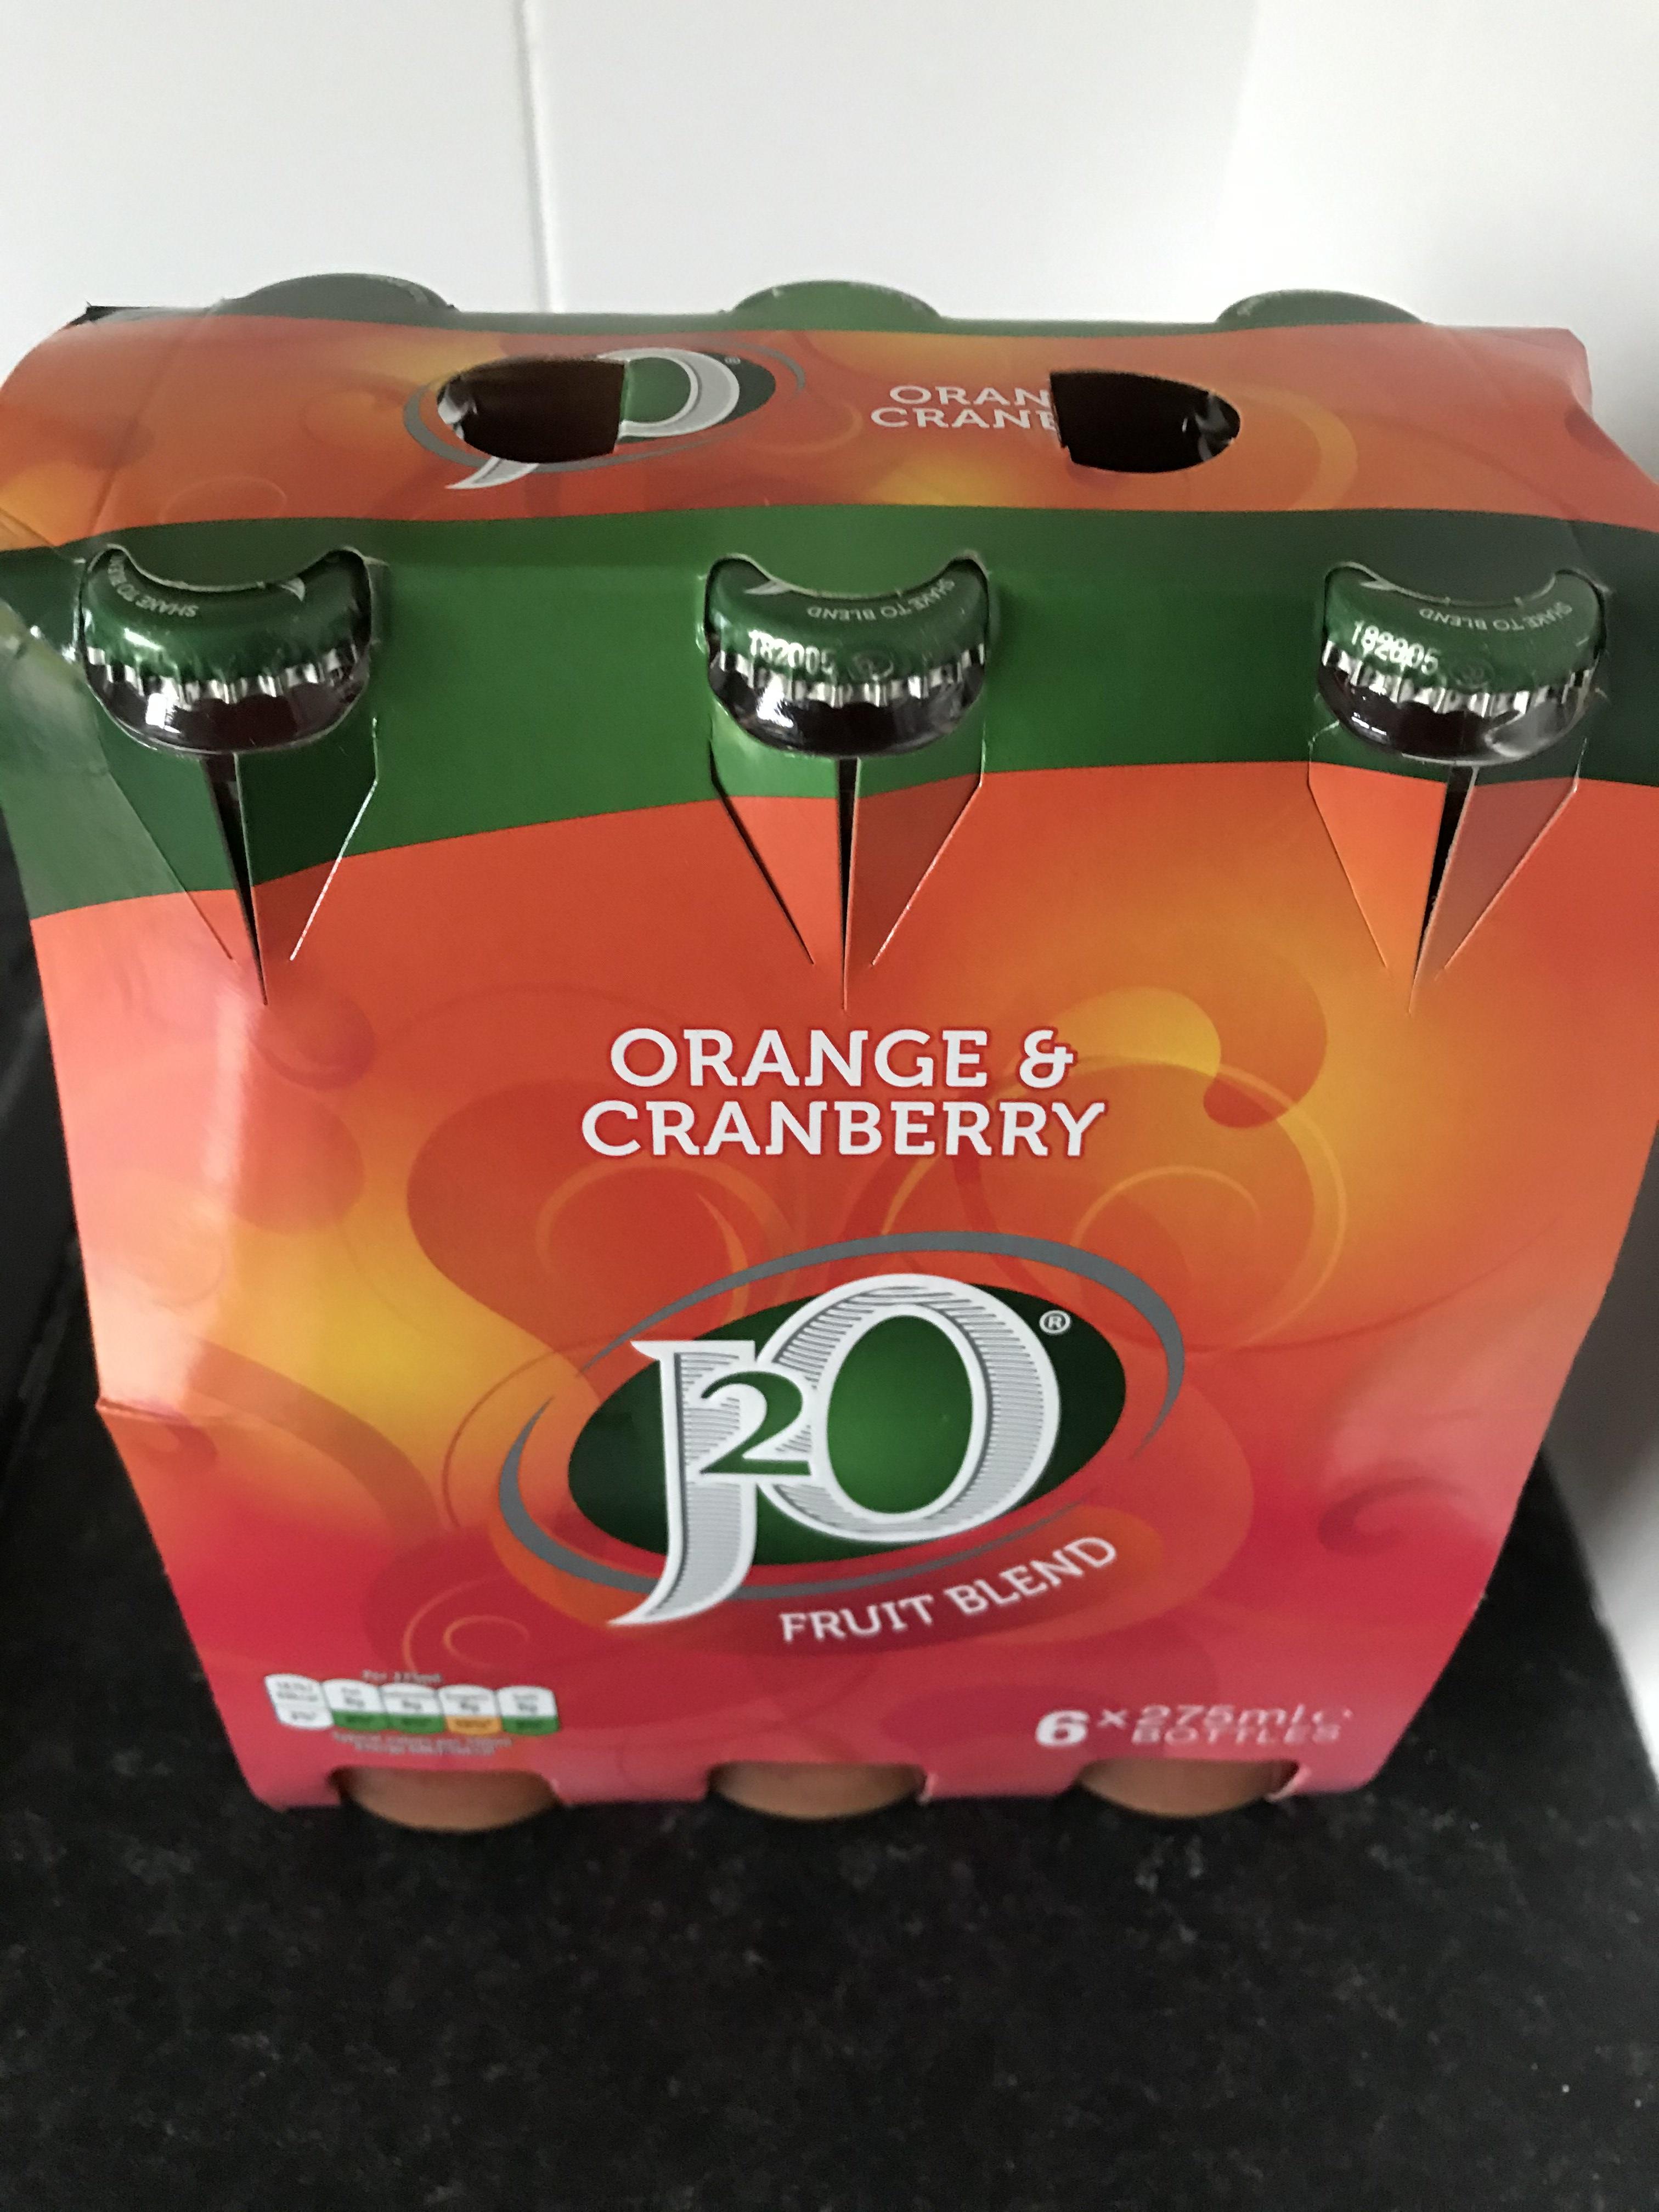 J20 Orange & Cranberry x6 bottles £1.99 @ Home Bargains (Hull)